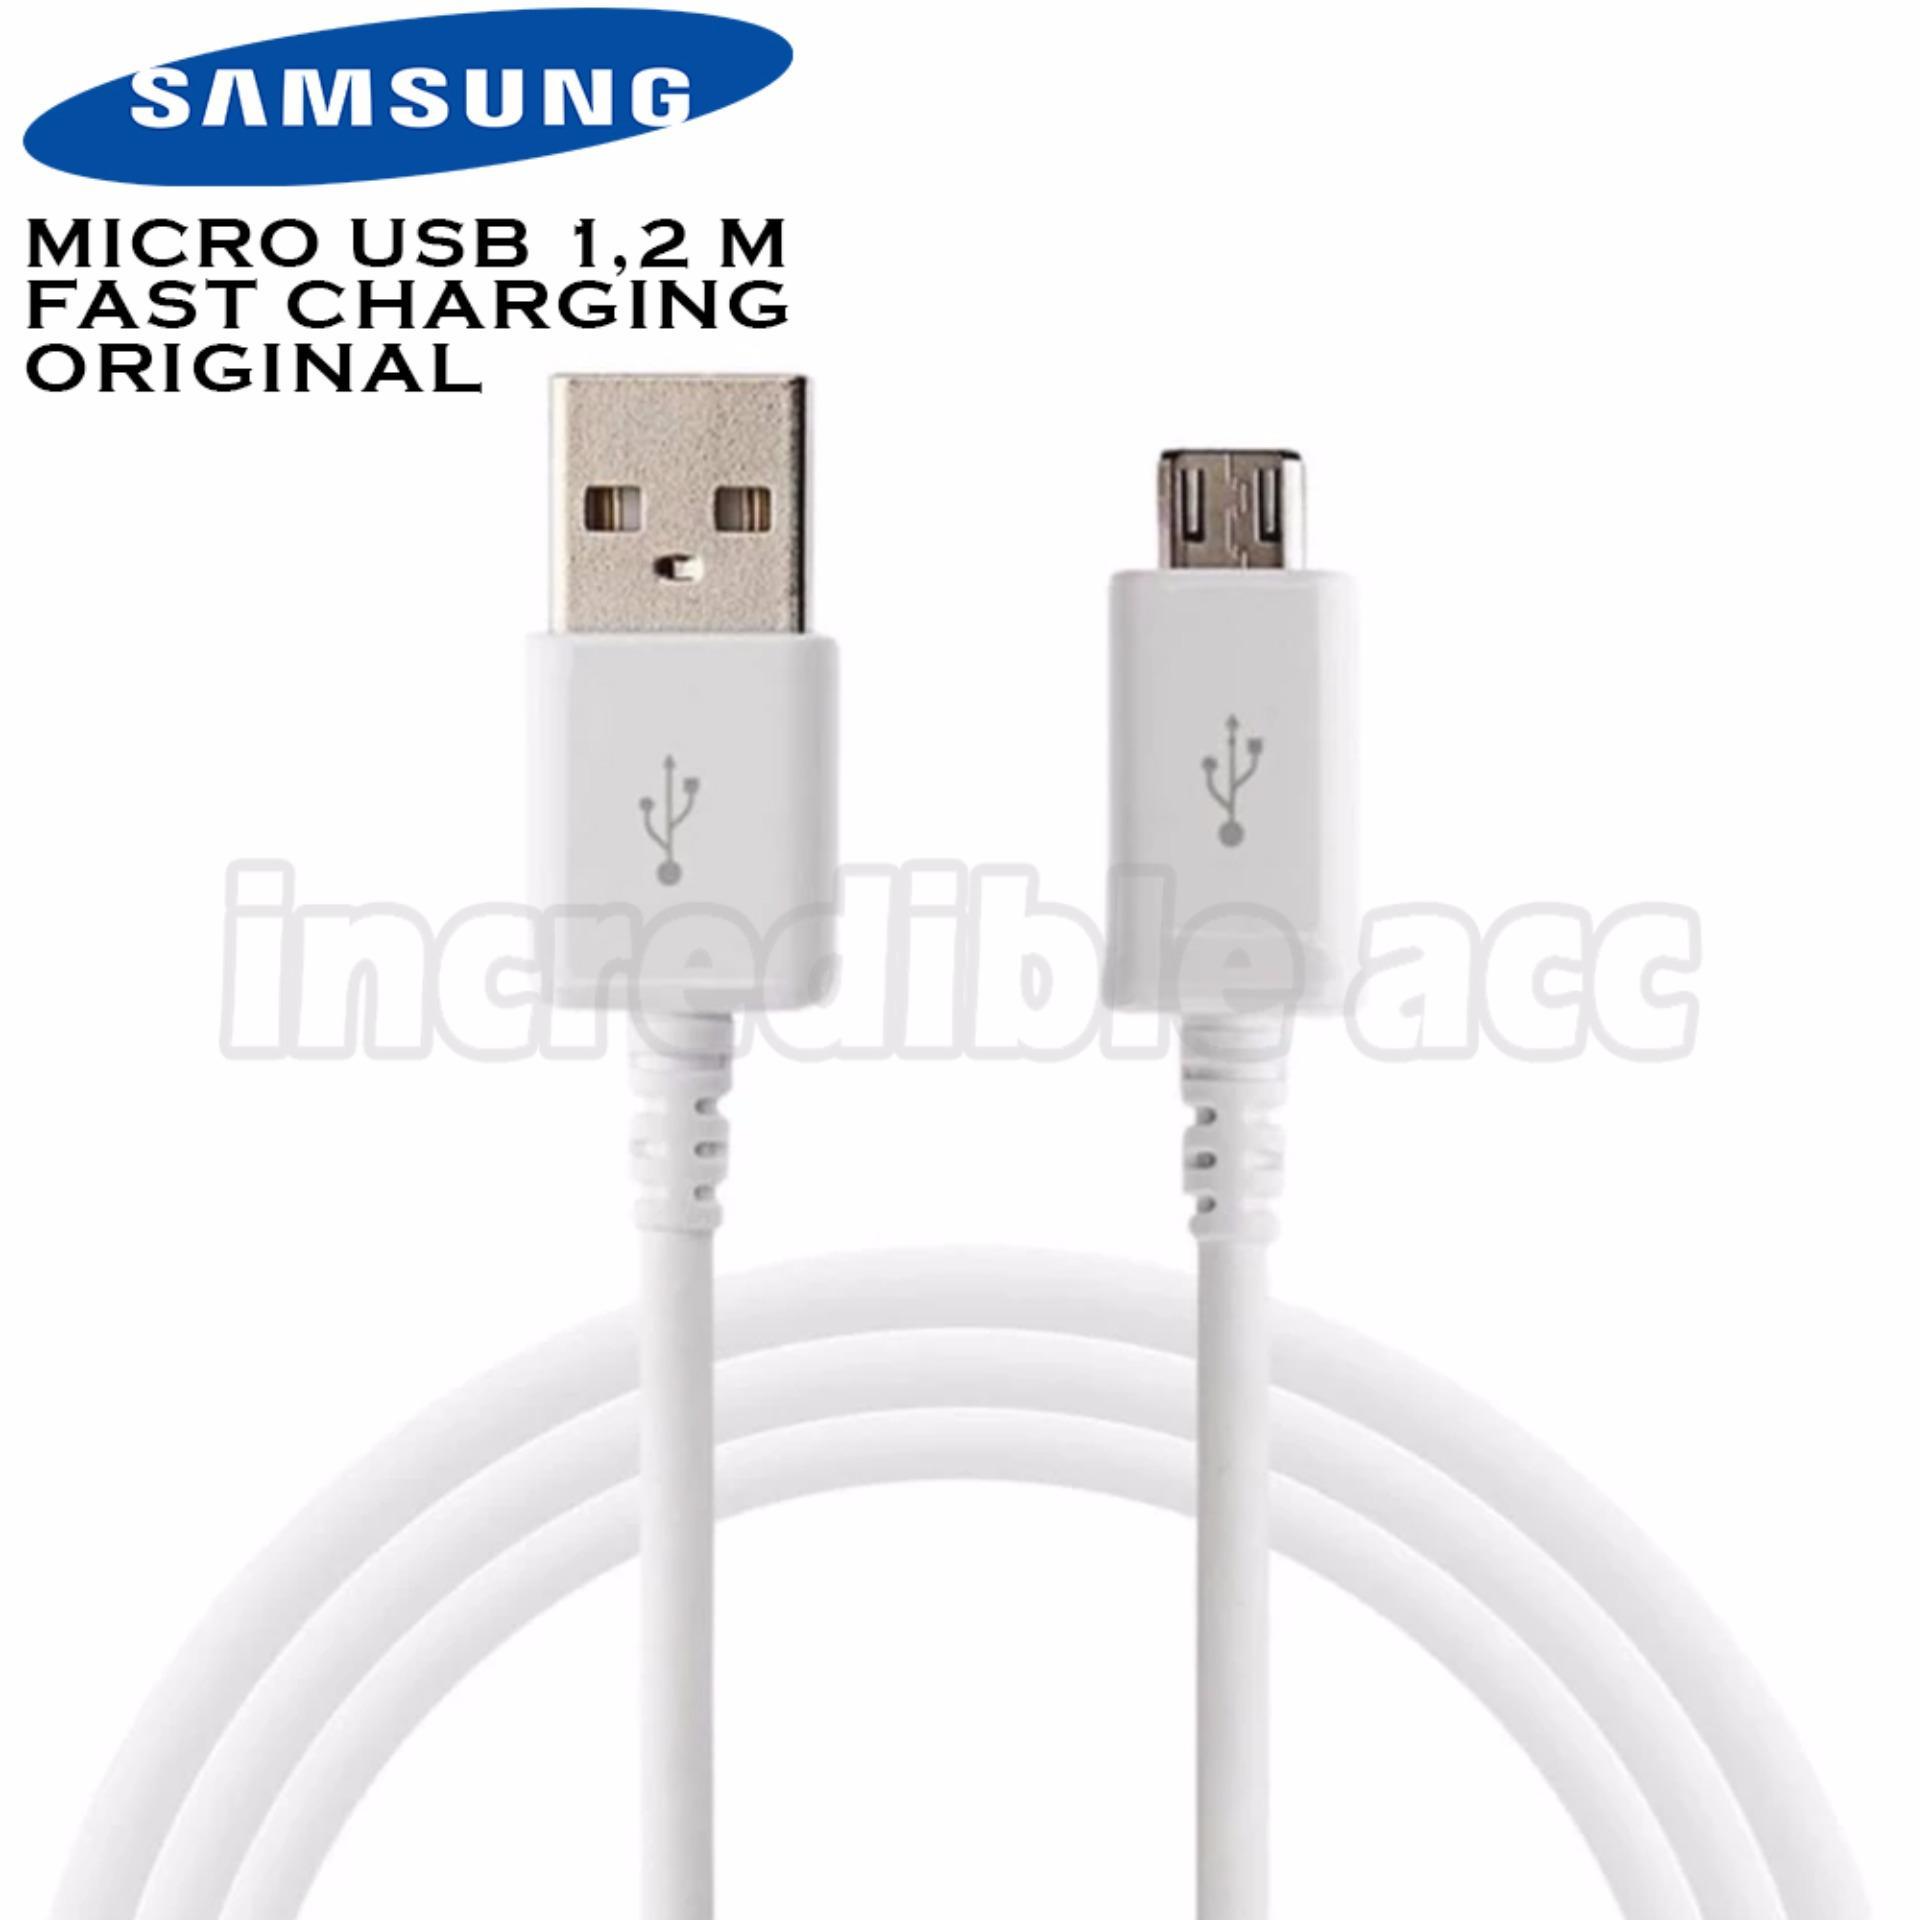 Samsung Kabel Data Panjang 1.2m ORIGINAL Kabel Charger Micro USB Fast Charging For Samsung All Type - Putih